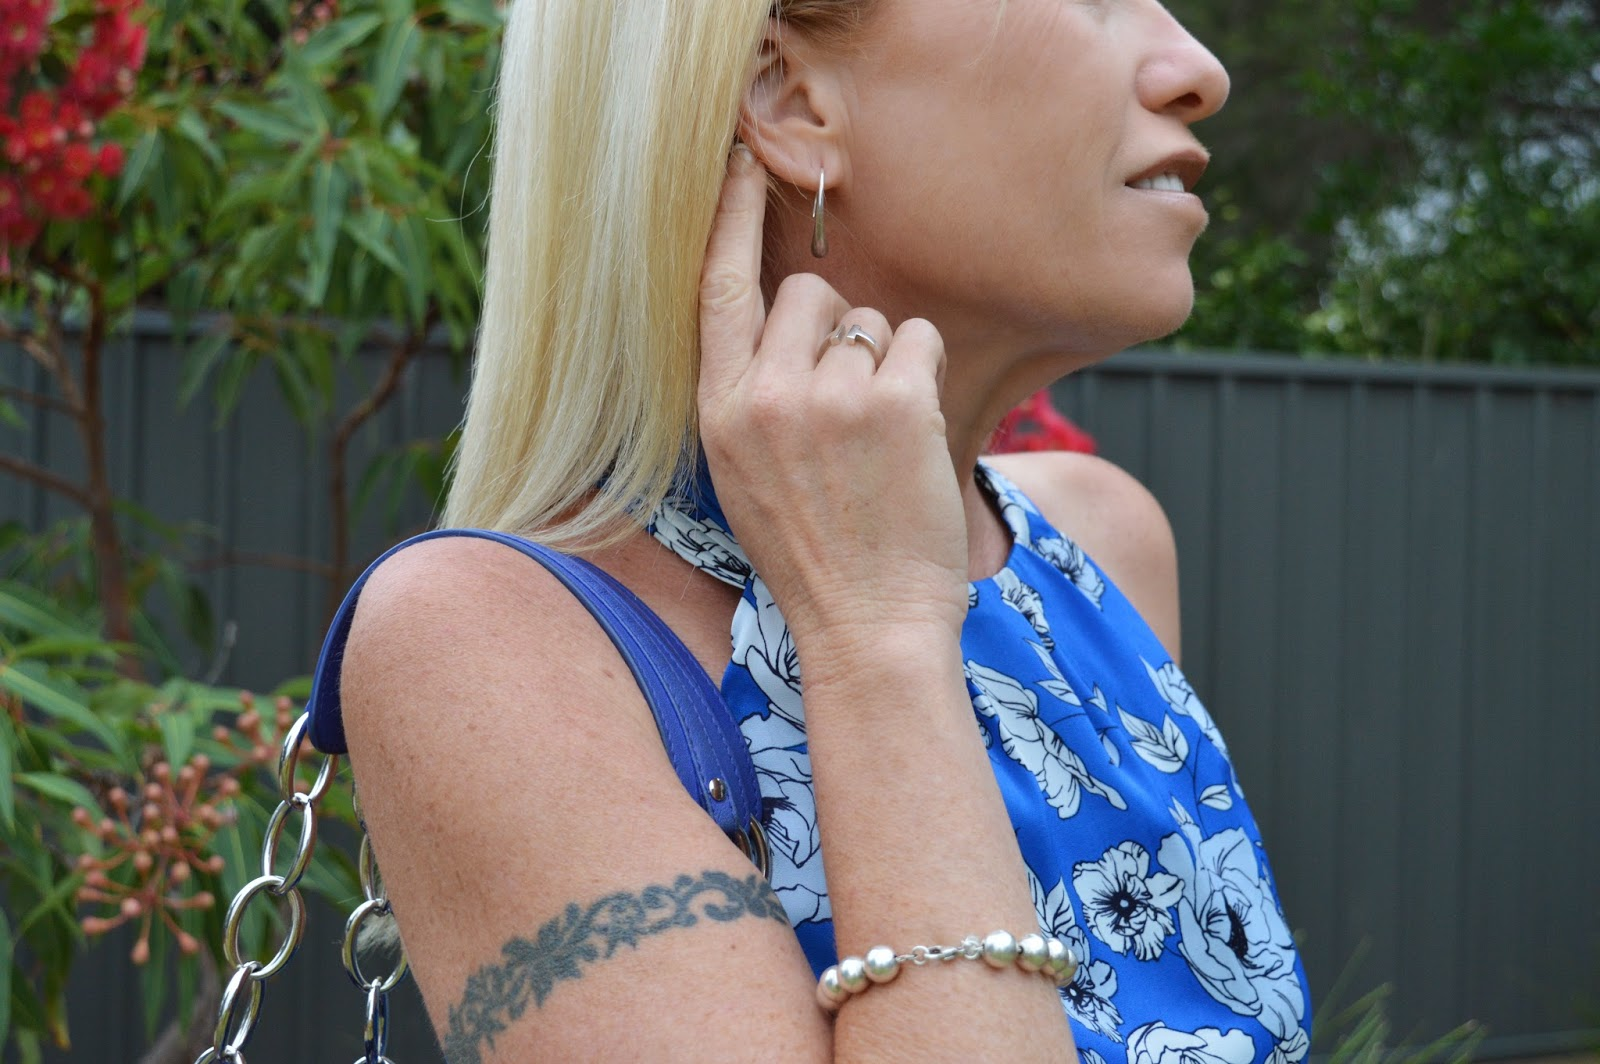 Sydney Fashion Hunter - White Pants, Blue Floral Top, Blue Dior Tote, Tiffany Earrings, Tiffany Bracelet, Tiffany Ring